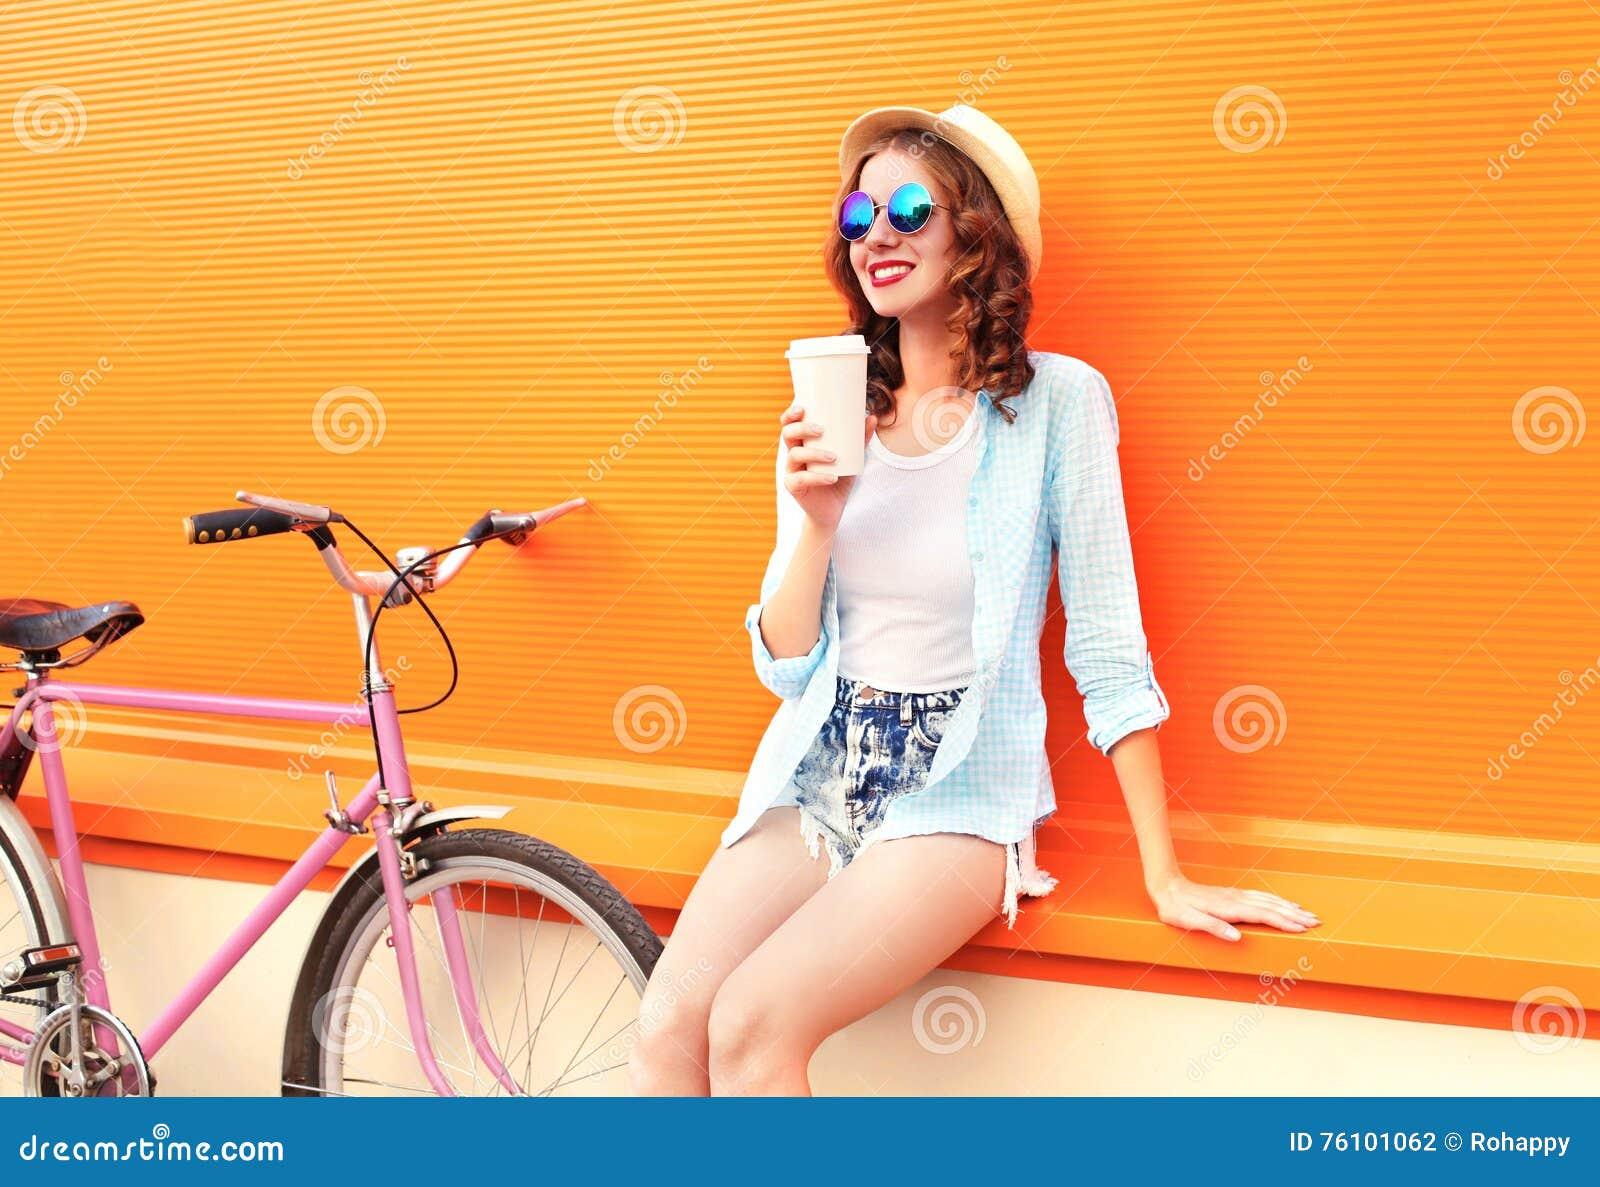 La mujer bonita de la moda bebe el café de la taza cerca de la bicicleta retra del rosa del vintage sobre naranja colorida